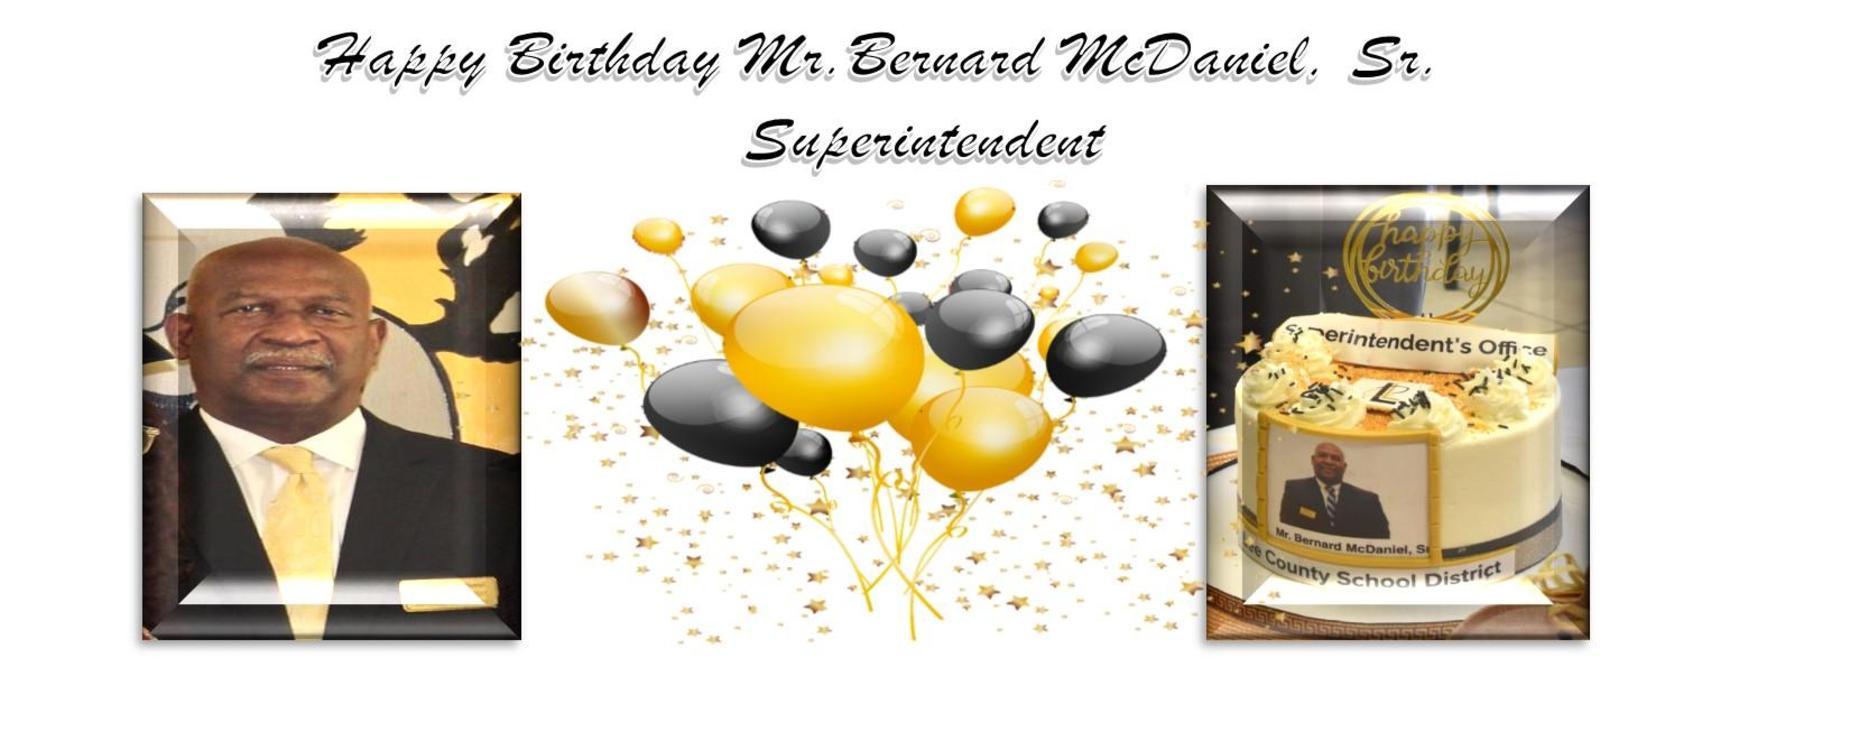 Happy Birthday Mr. McDaniel